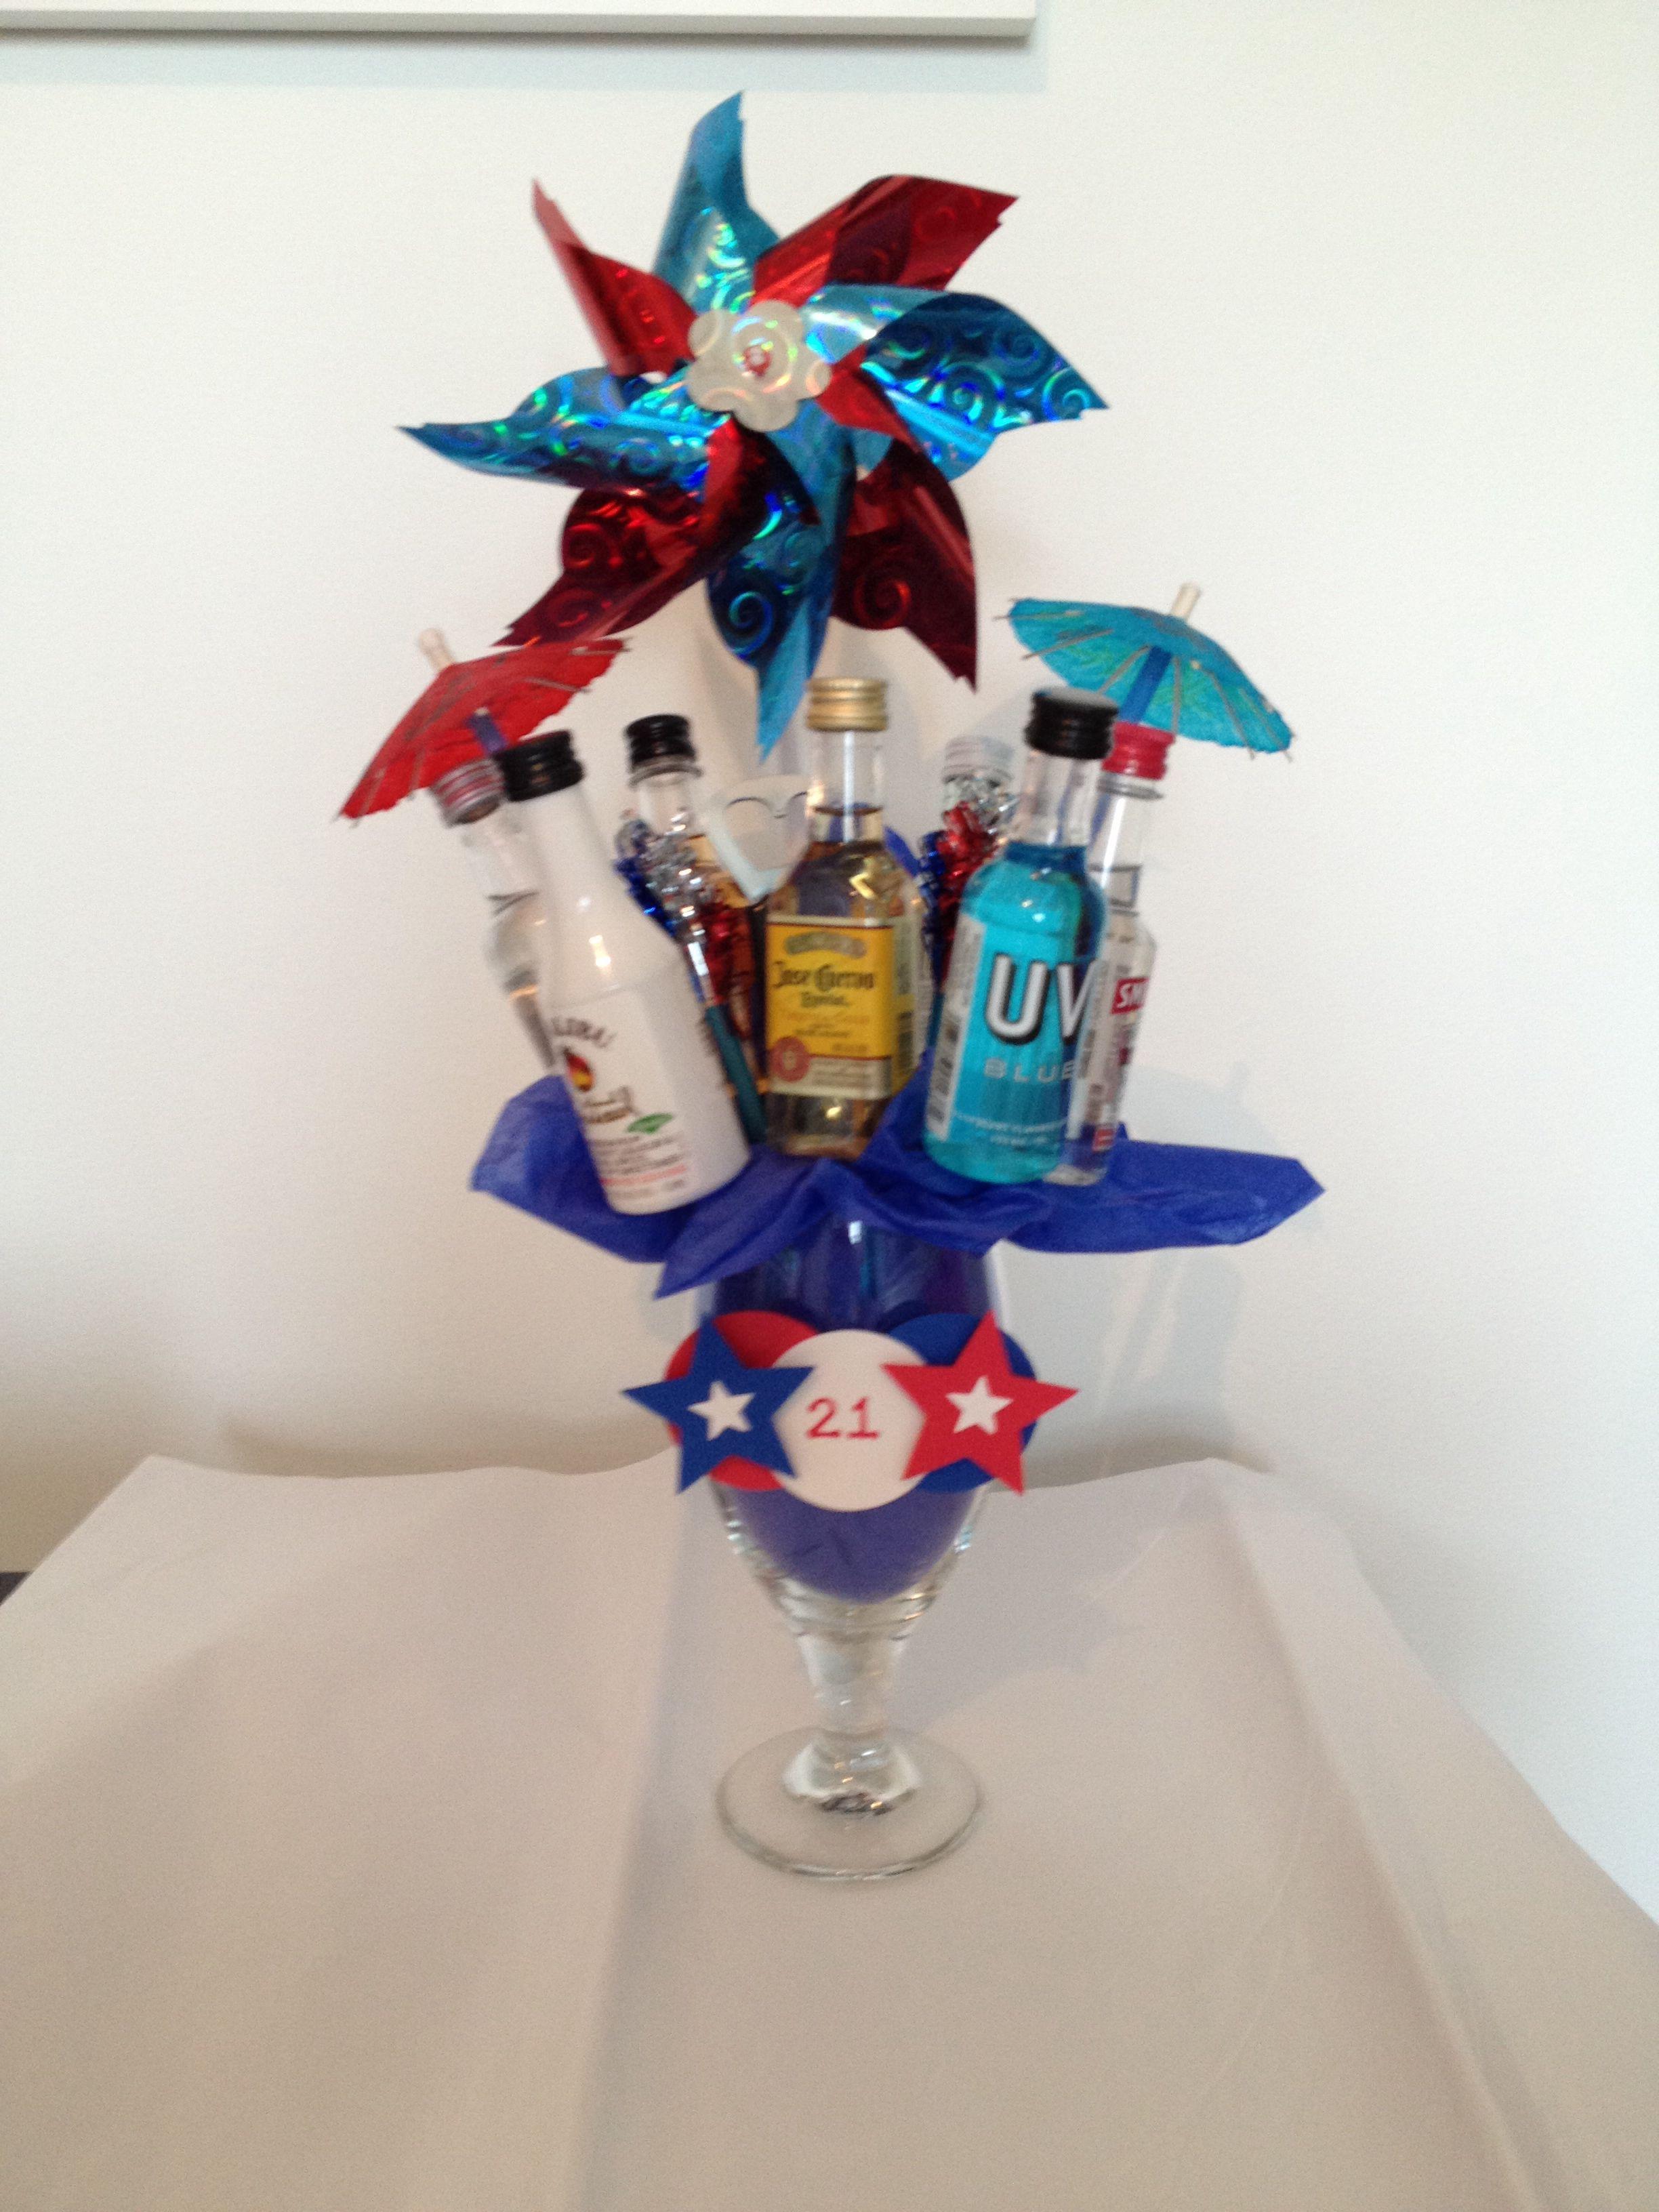 21st birthday mini liquor bottle bouquet4th of july